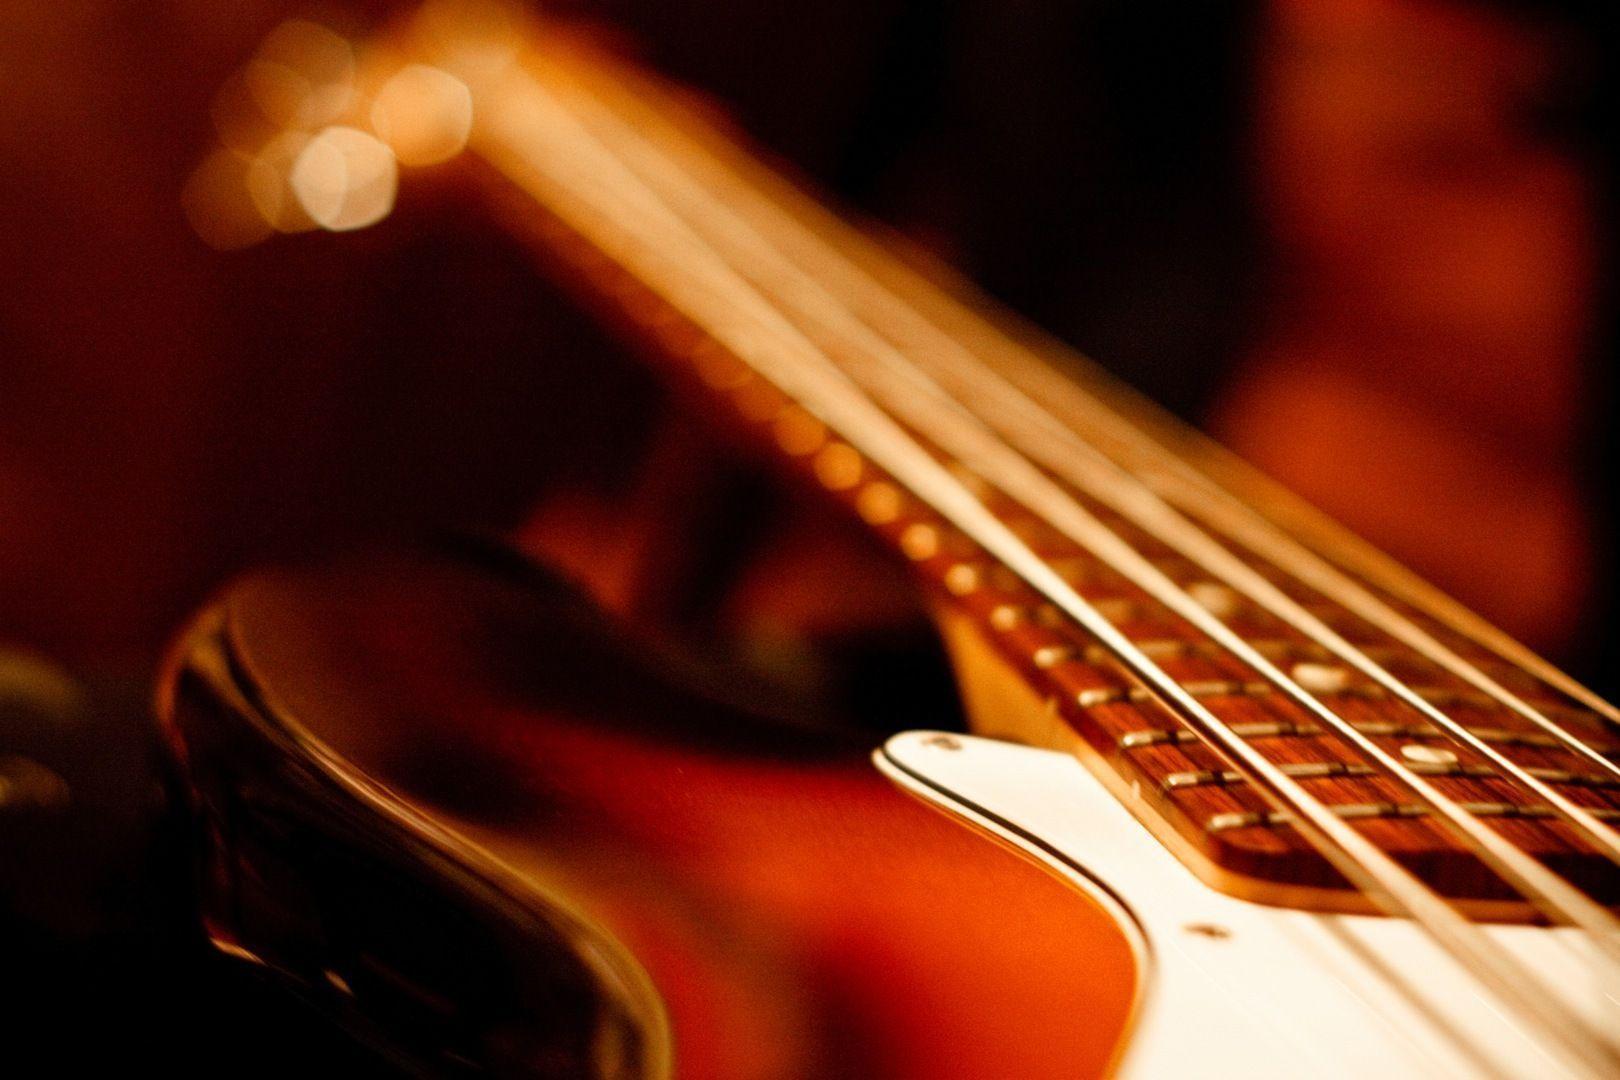 Bass Guitar Stock Images RoyaltyFree Images amp Vectors